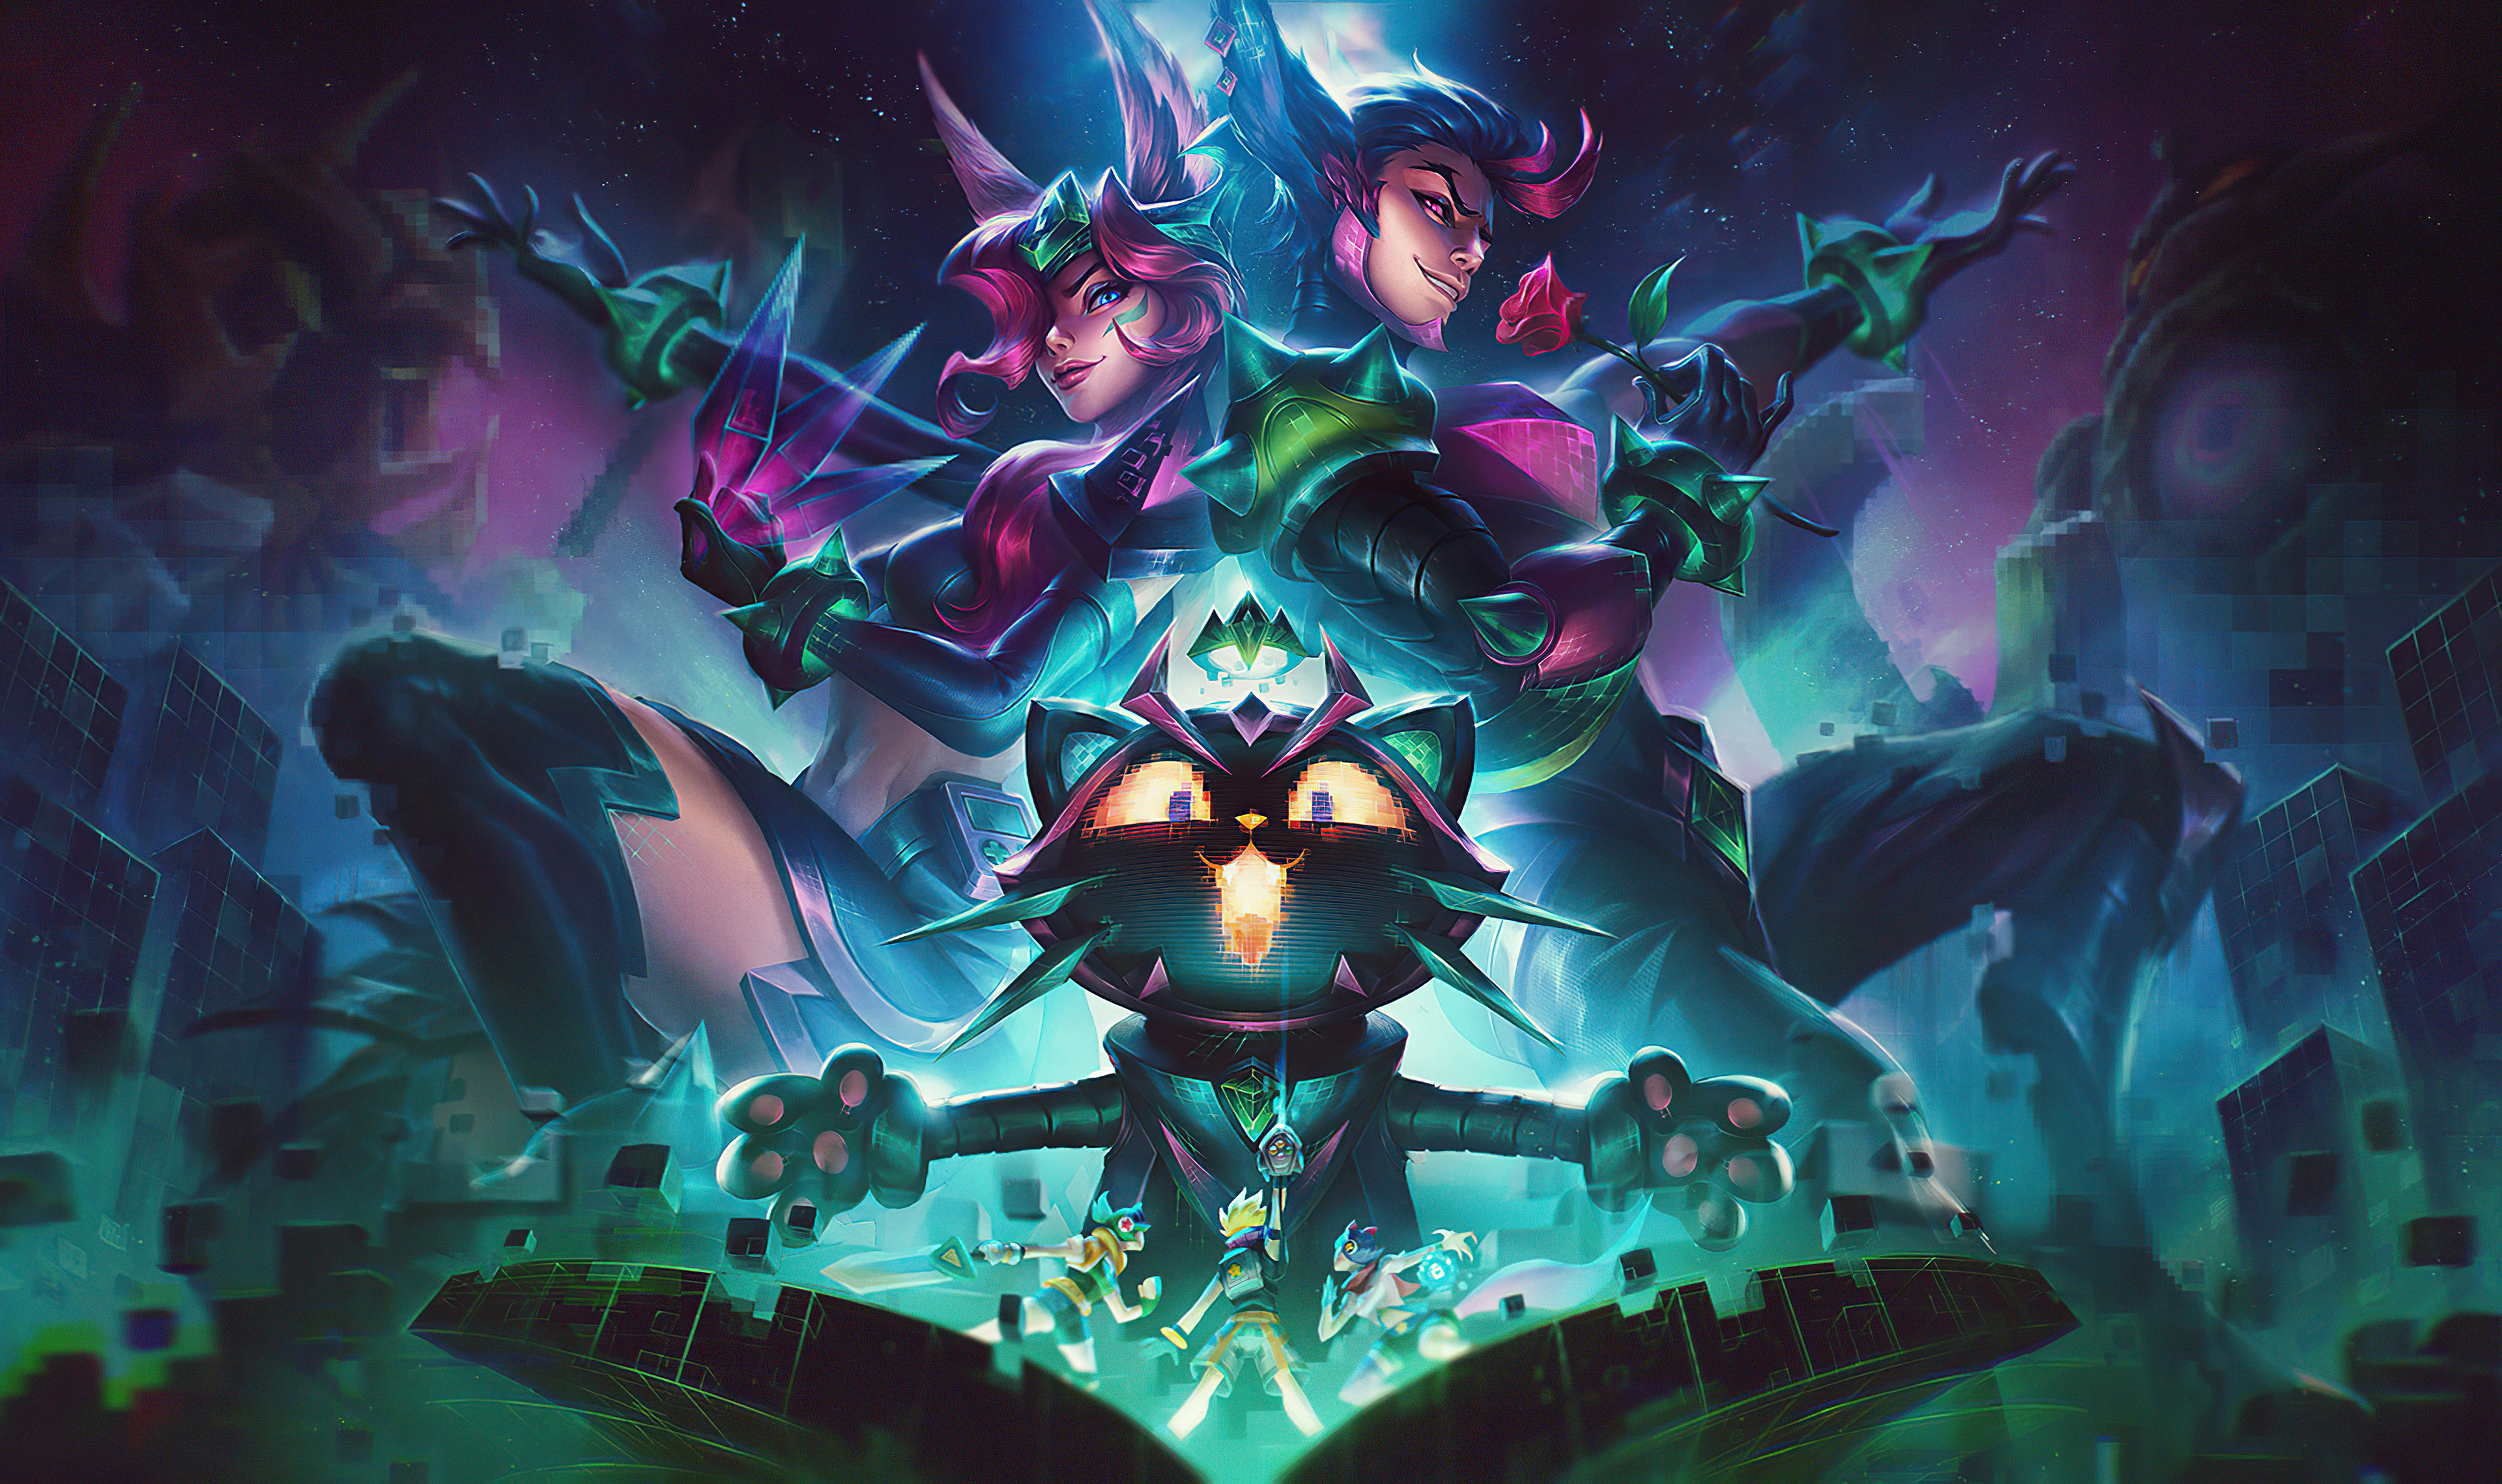 Wallpaper Battle Boss Xayah and Yuumi League of Legends